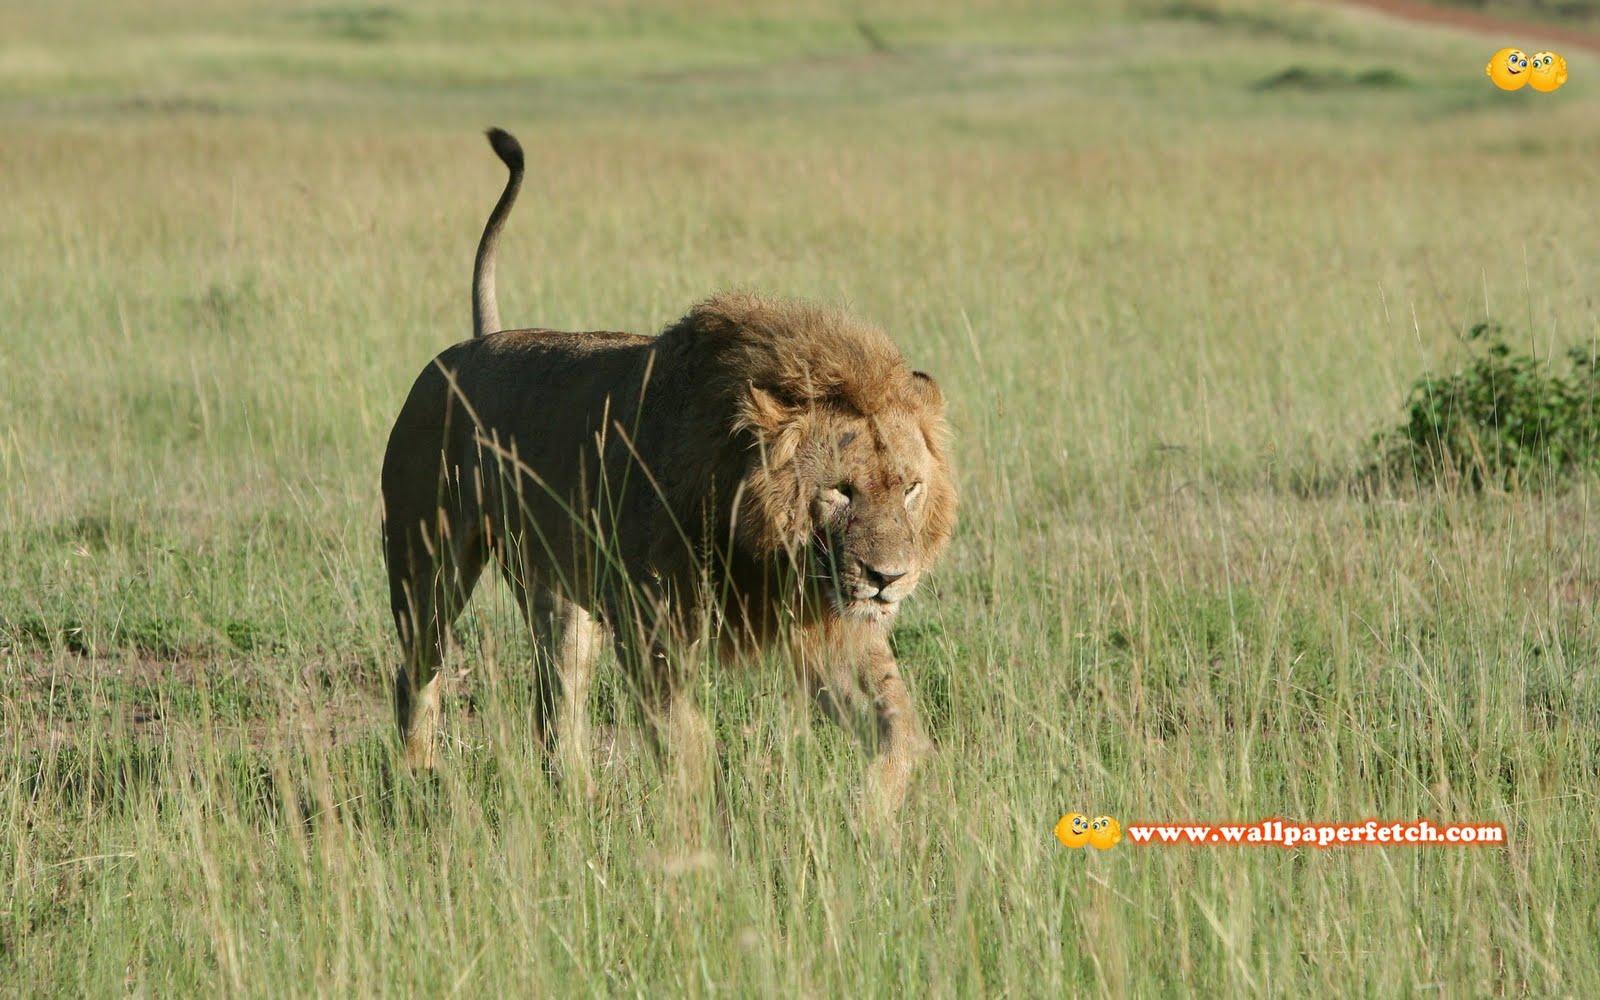 http://2.bp.blogspot.com/-B1jtE2uJjlc/TyFWY8qH7CI/AAAAAAAAE2k/1YMesPbpGvQ/s1600/SuperPack_Beautiful_Animals_HD_Wallpapers_Part_32.46.jpg